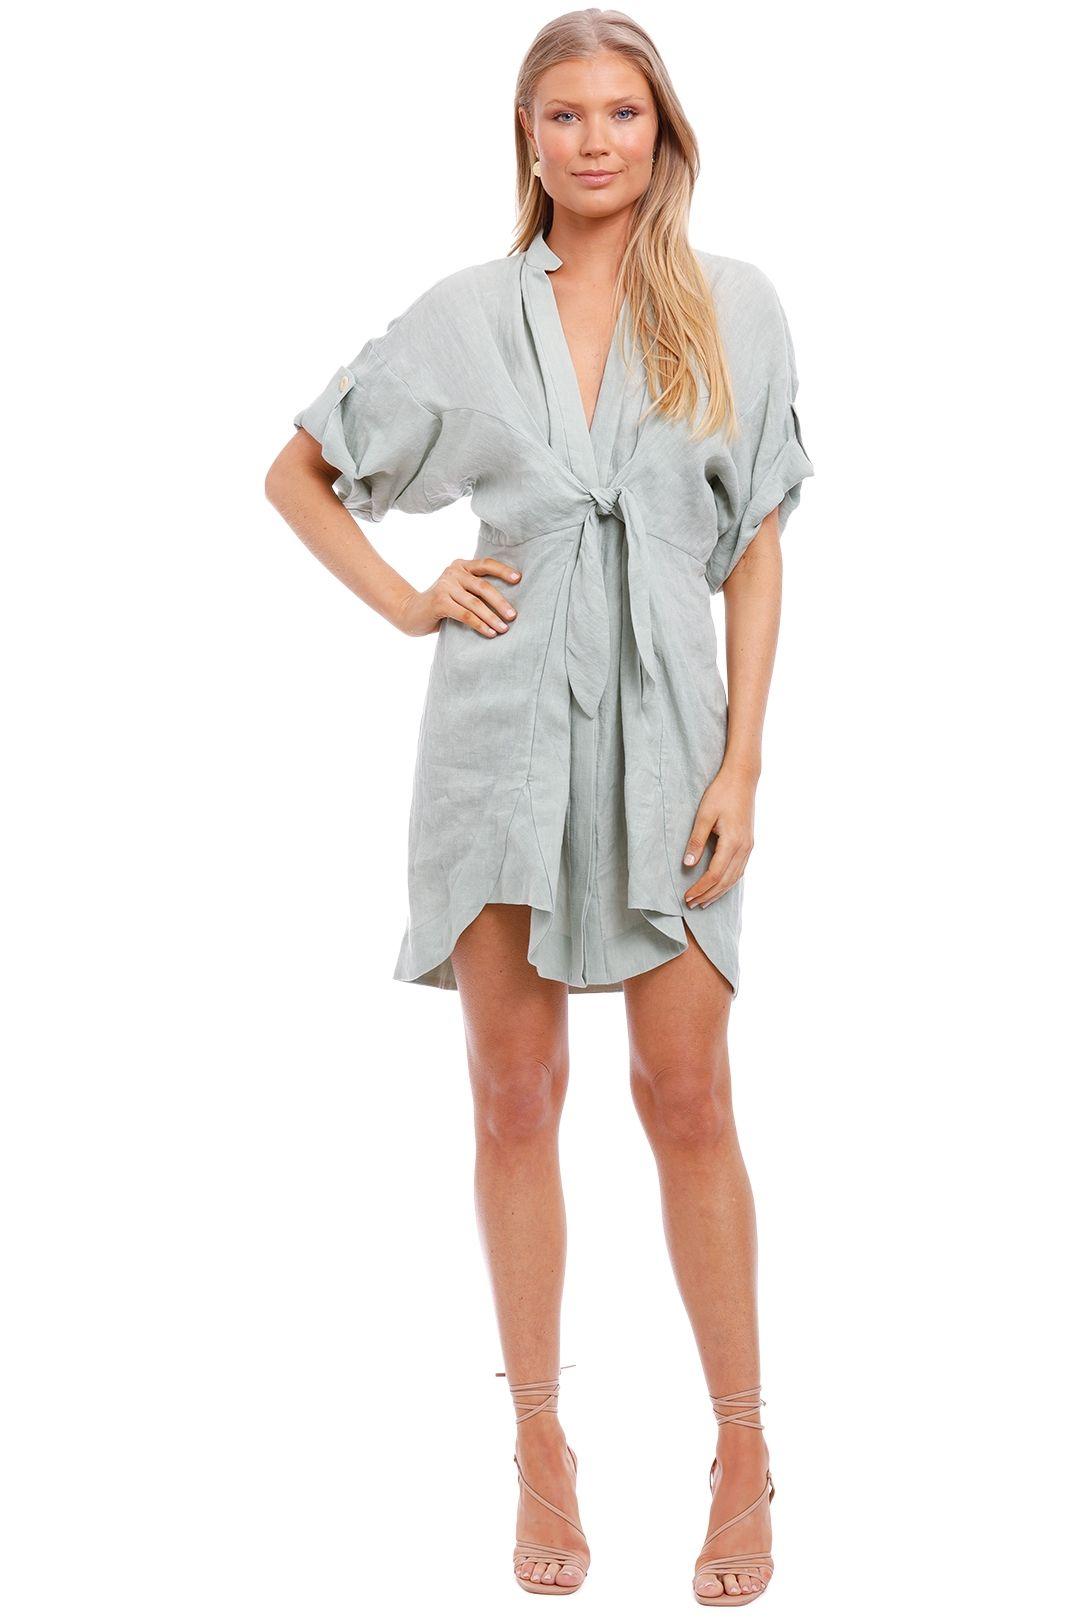 KITX Endangered Shirt Dress